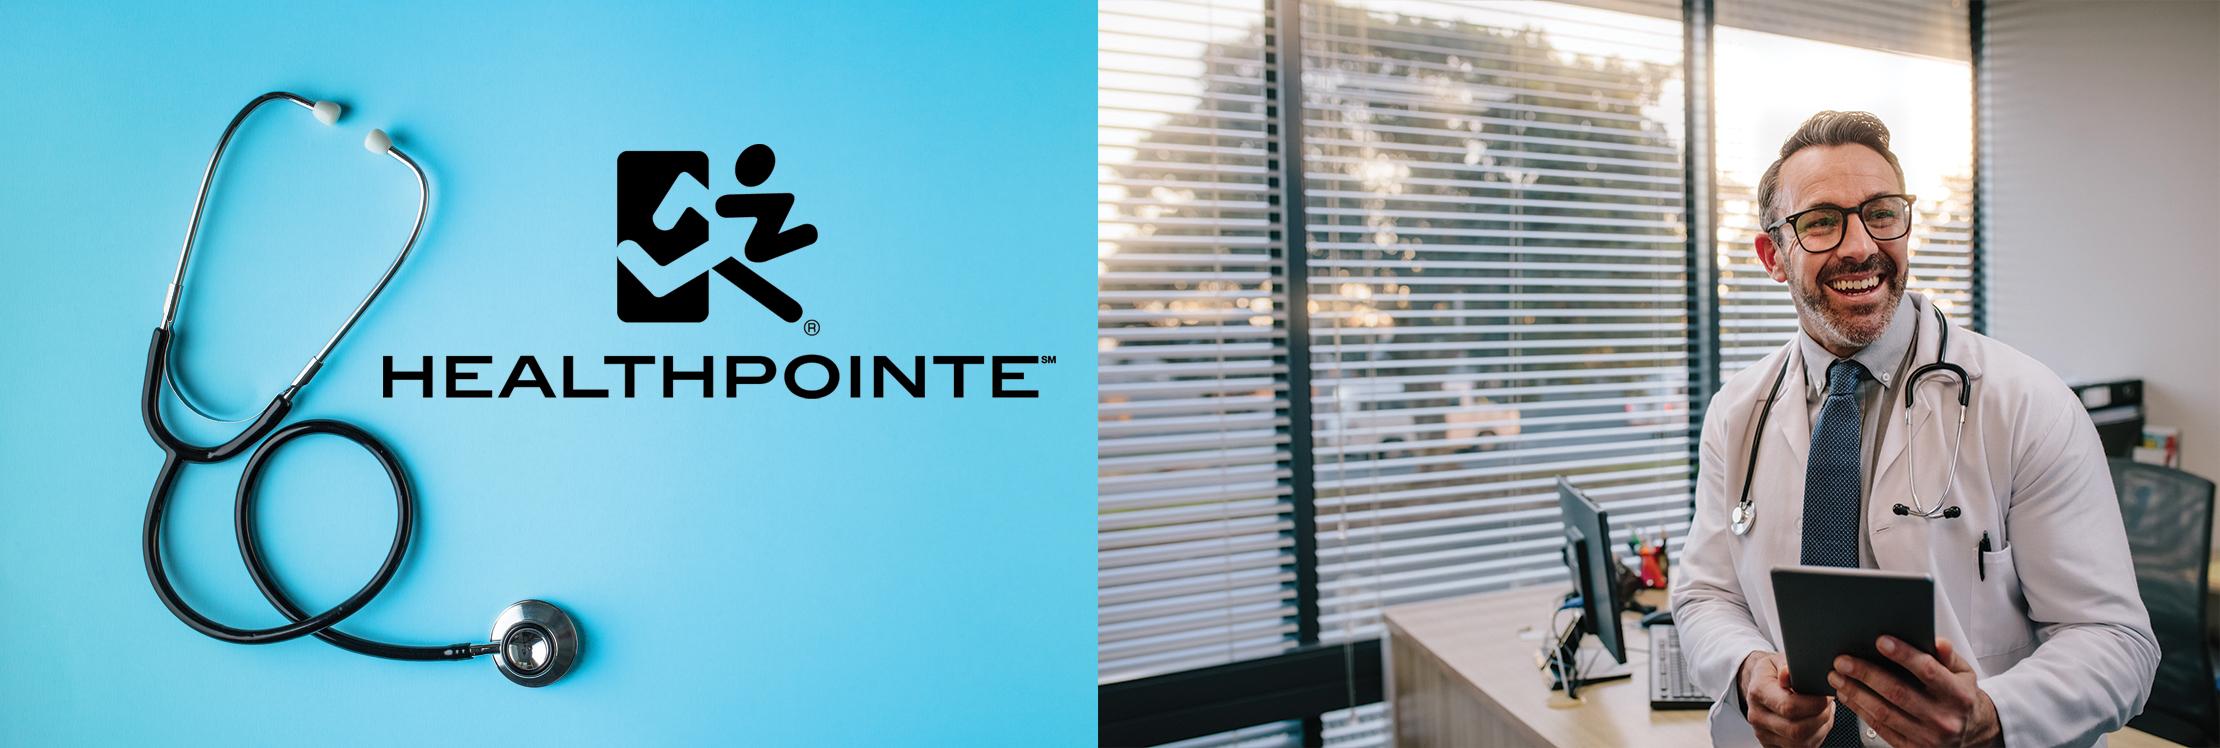 Healthpointe reviews | Orthopedists at 1171 Railroad St - Corona CA